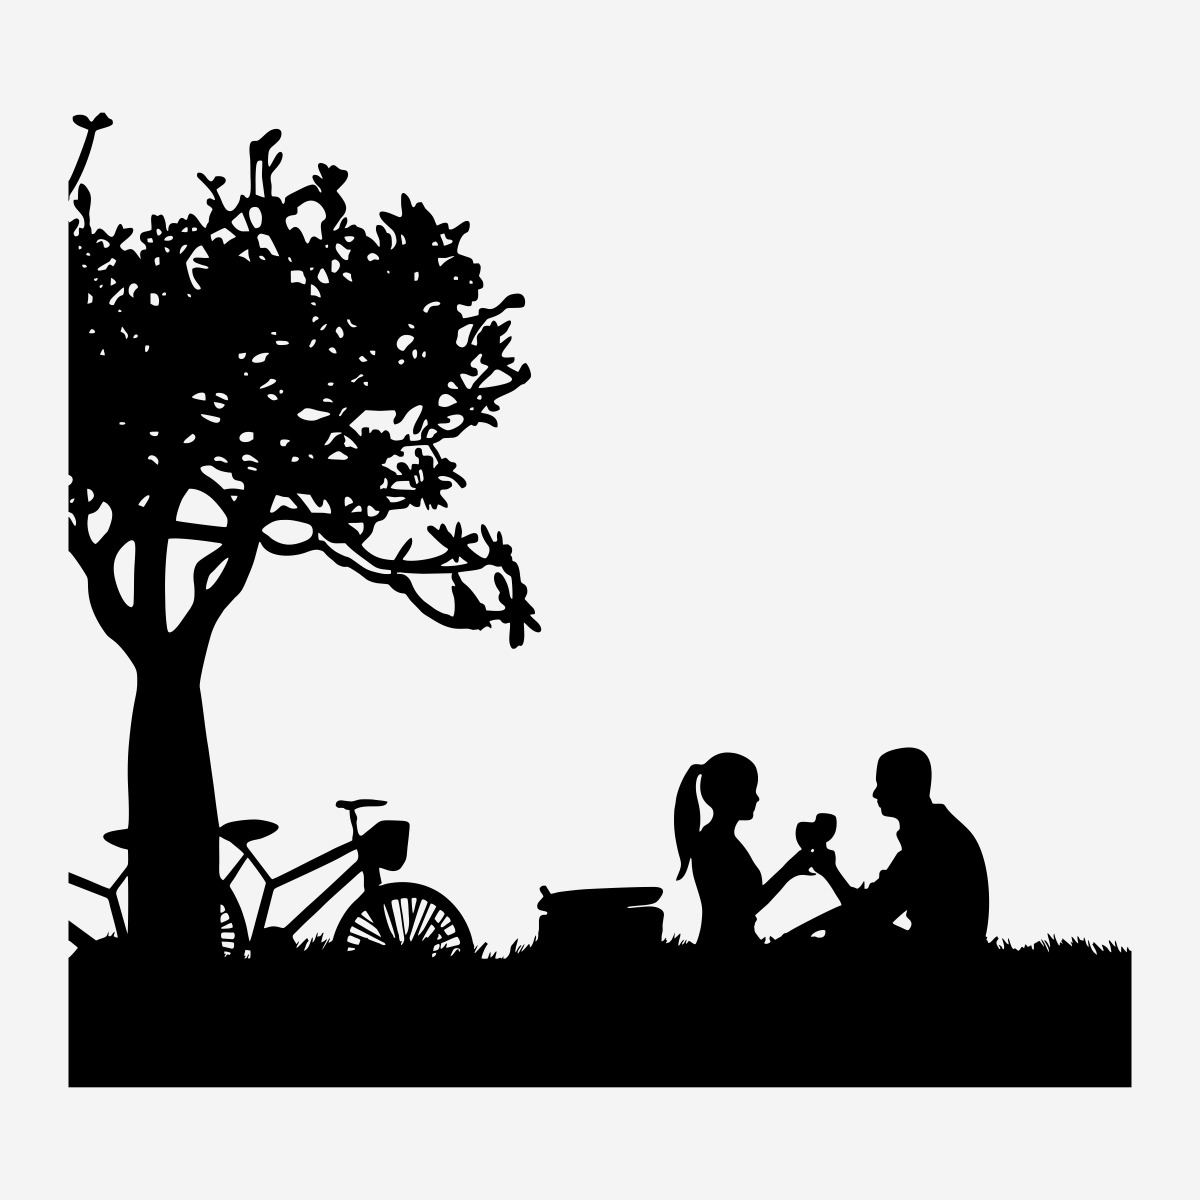 Adesivo Amor Noivinhos Casal Apaixonado Natureza 40cm A254 R 25